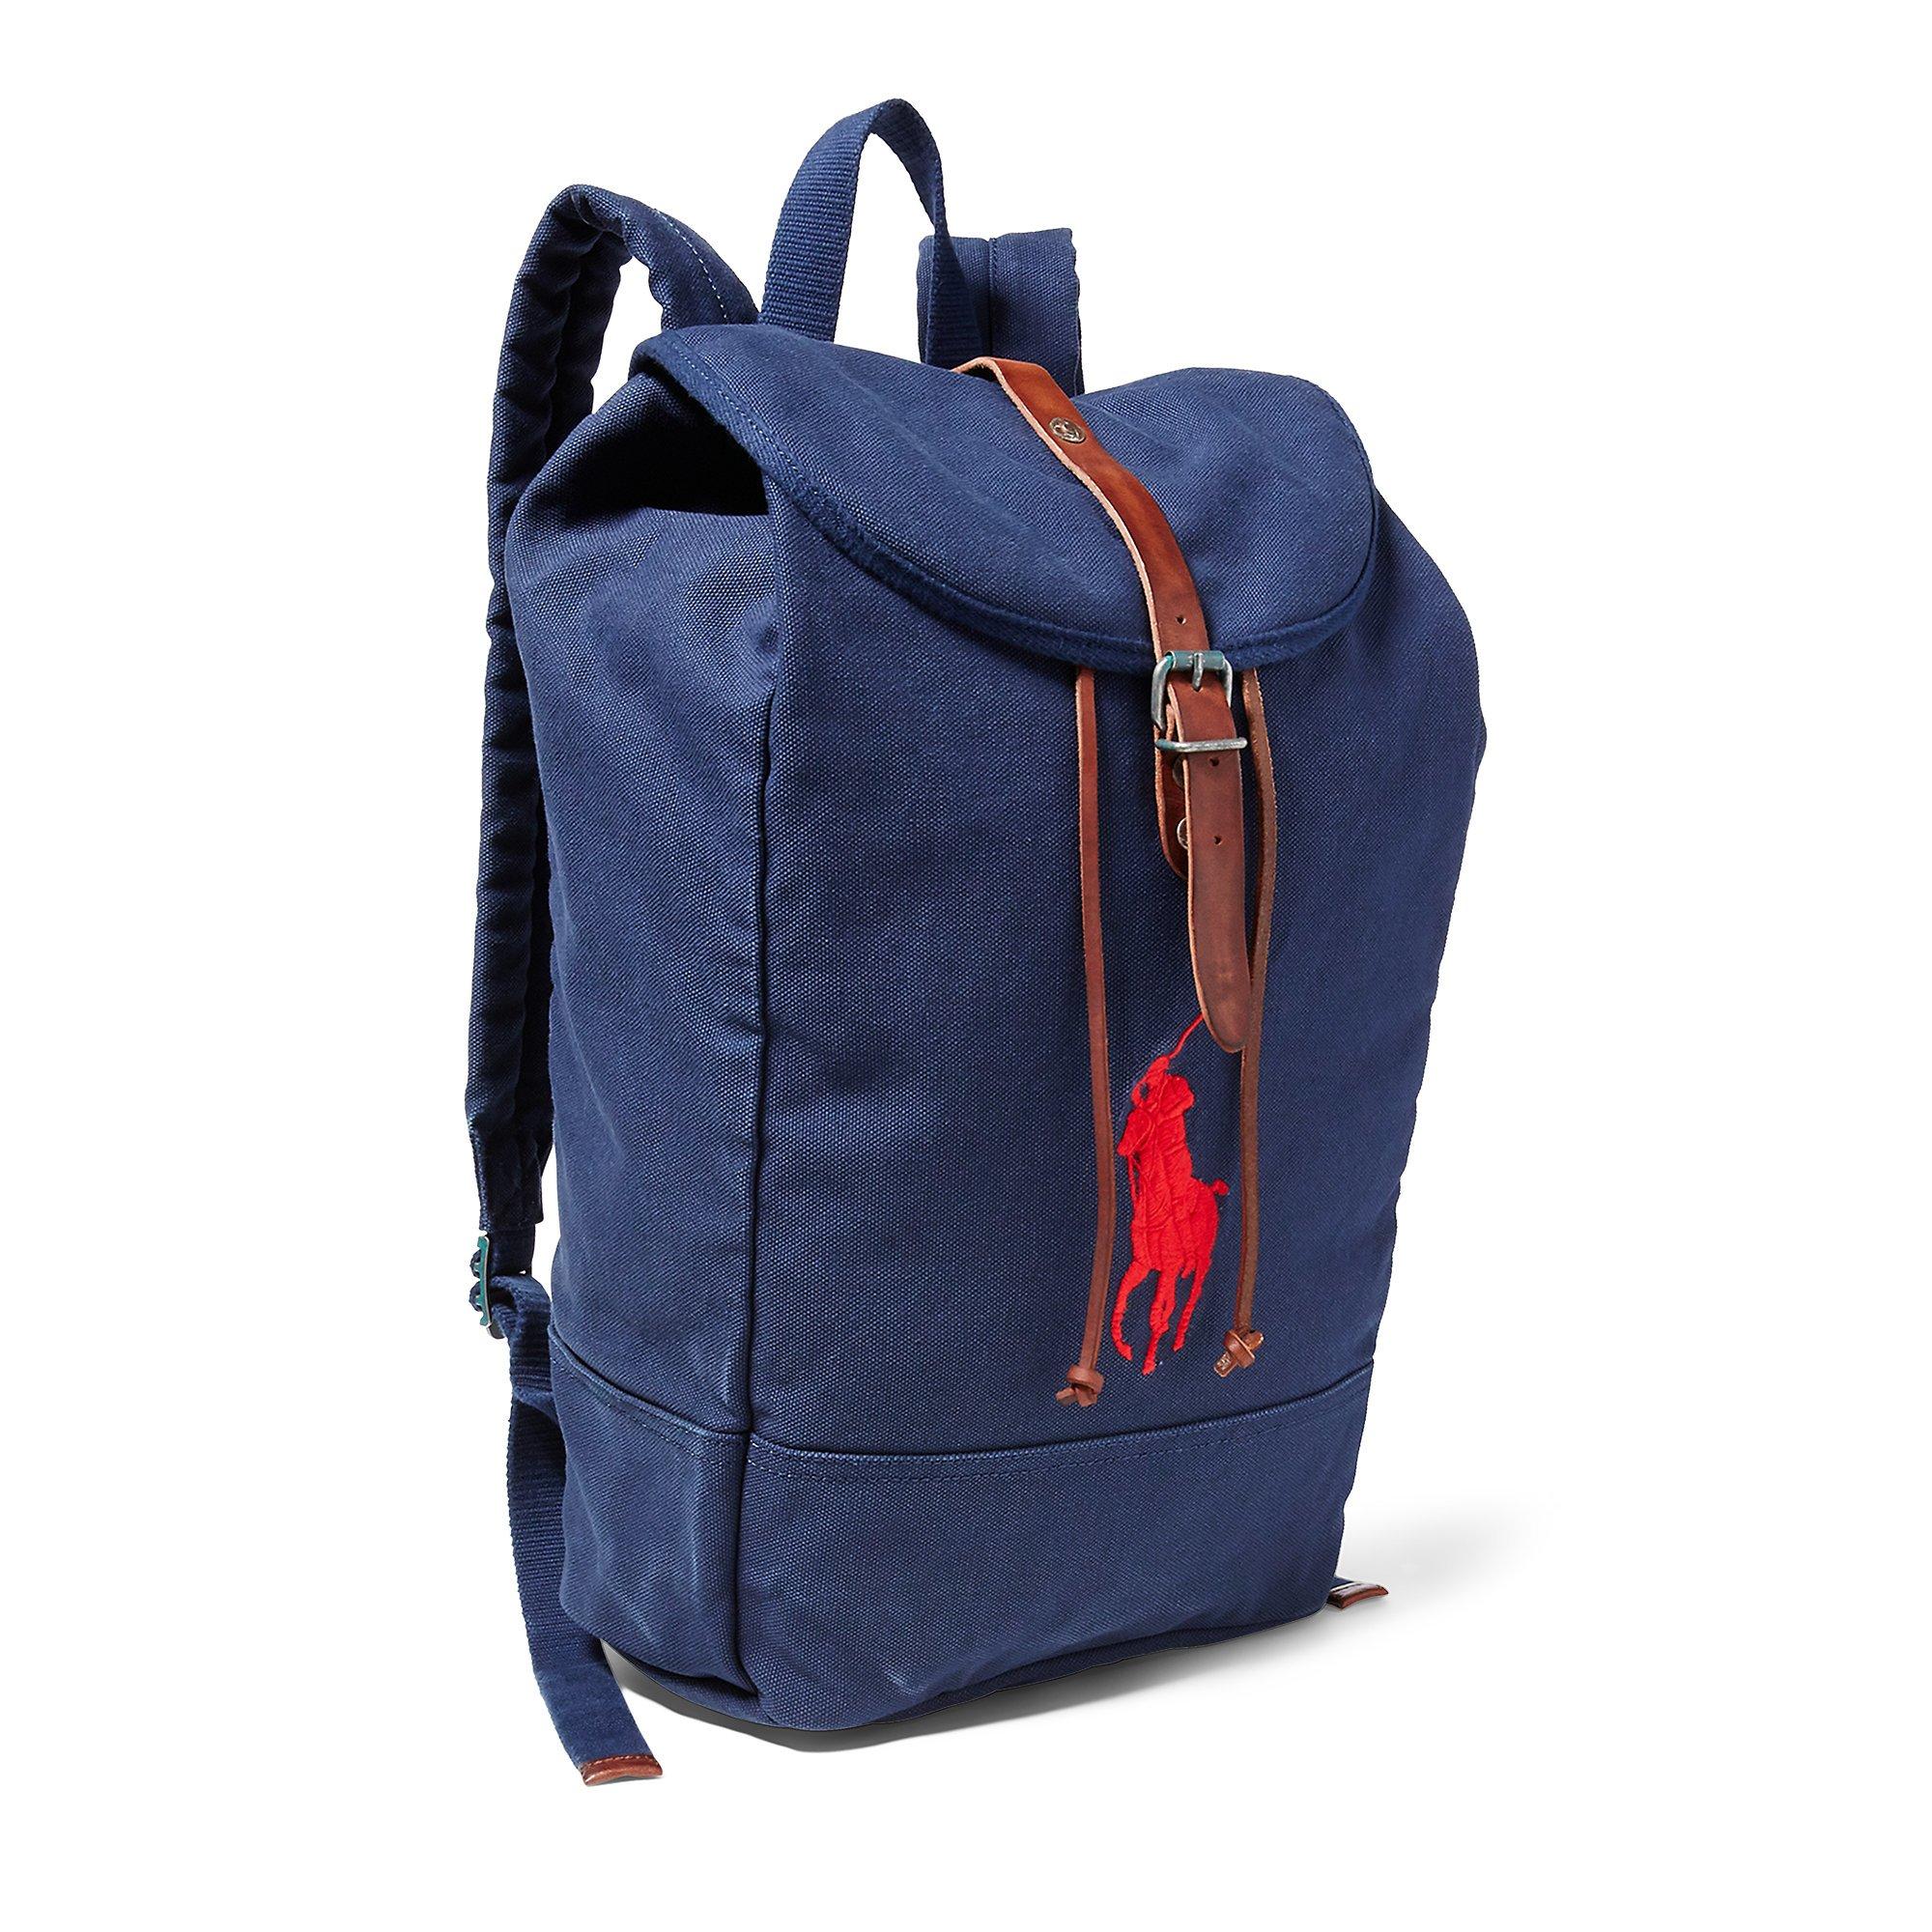 57f20a12a6 Ralph Lauren Big Pony Canvas Backpack- Fenix Toulouse Handball